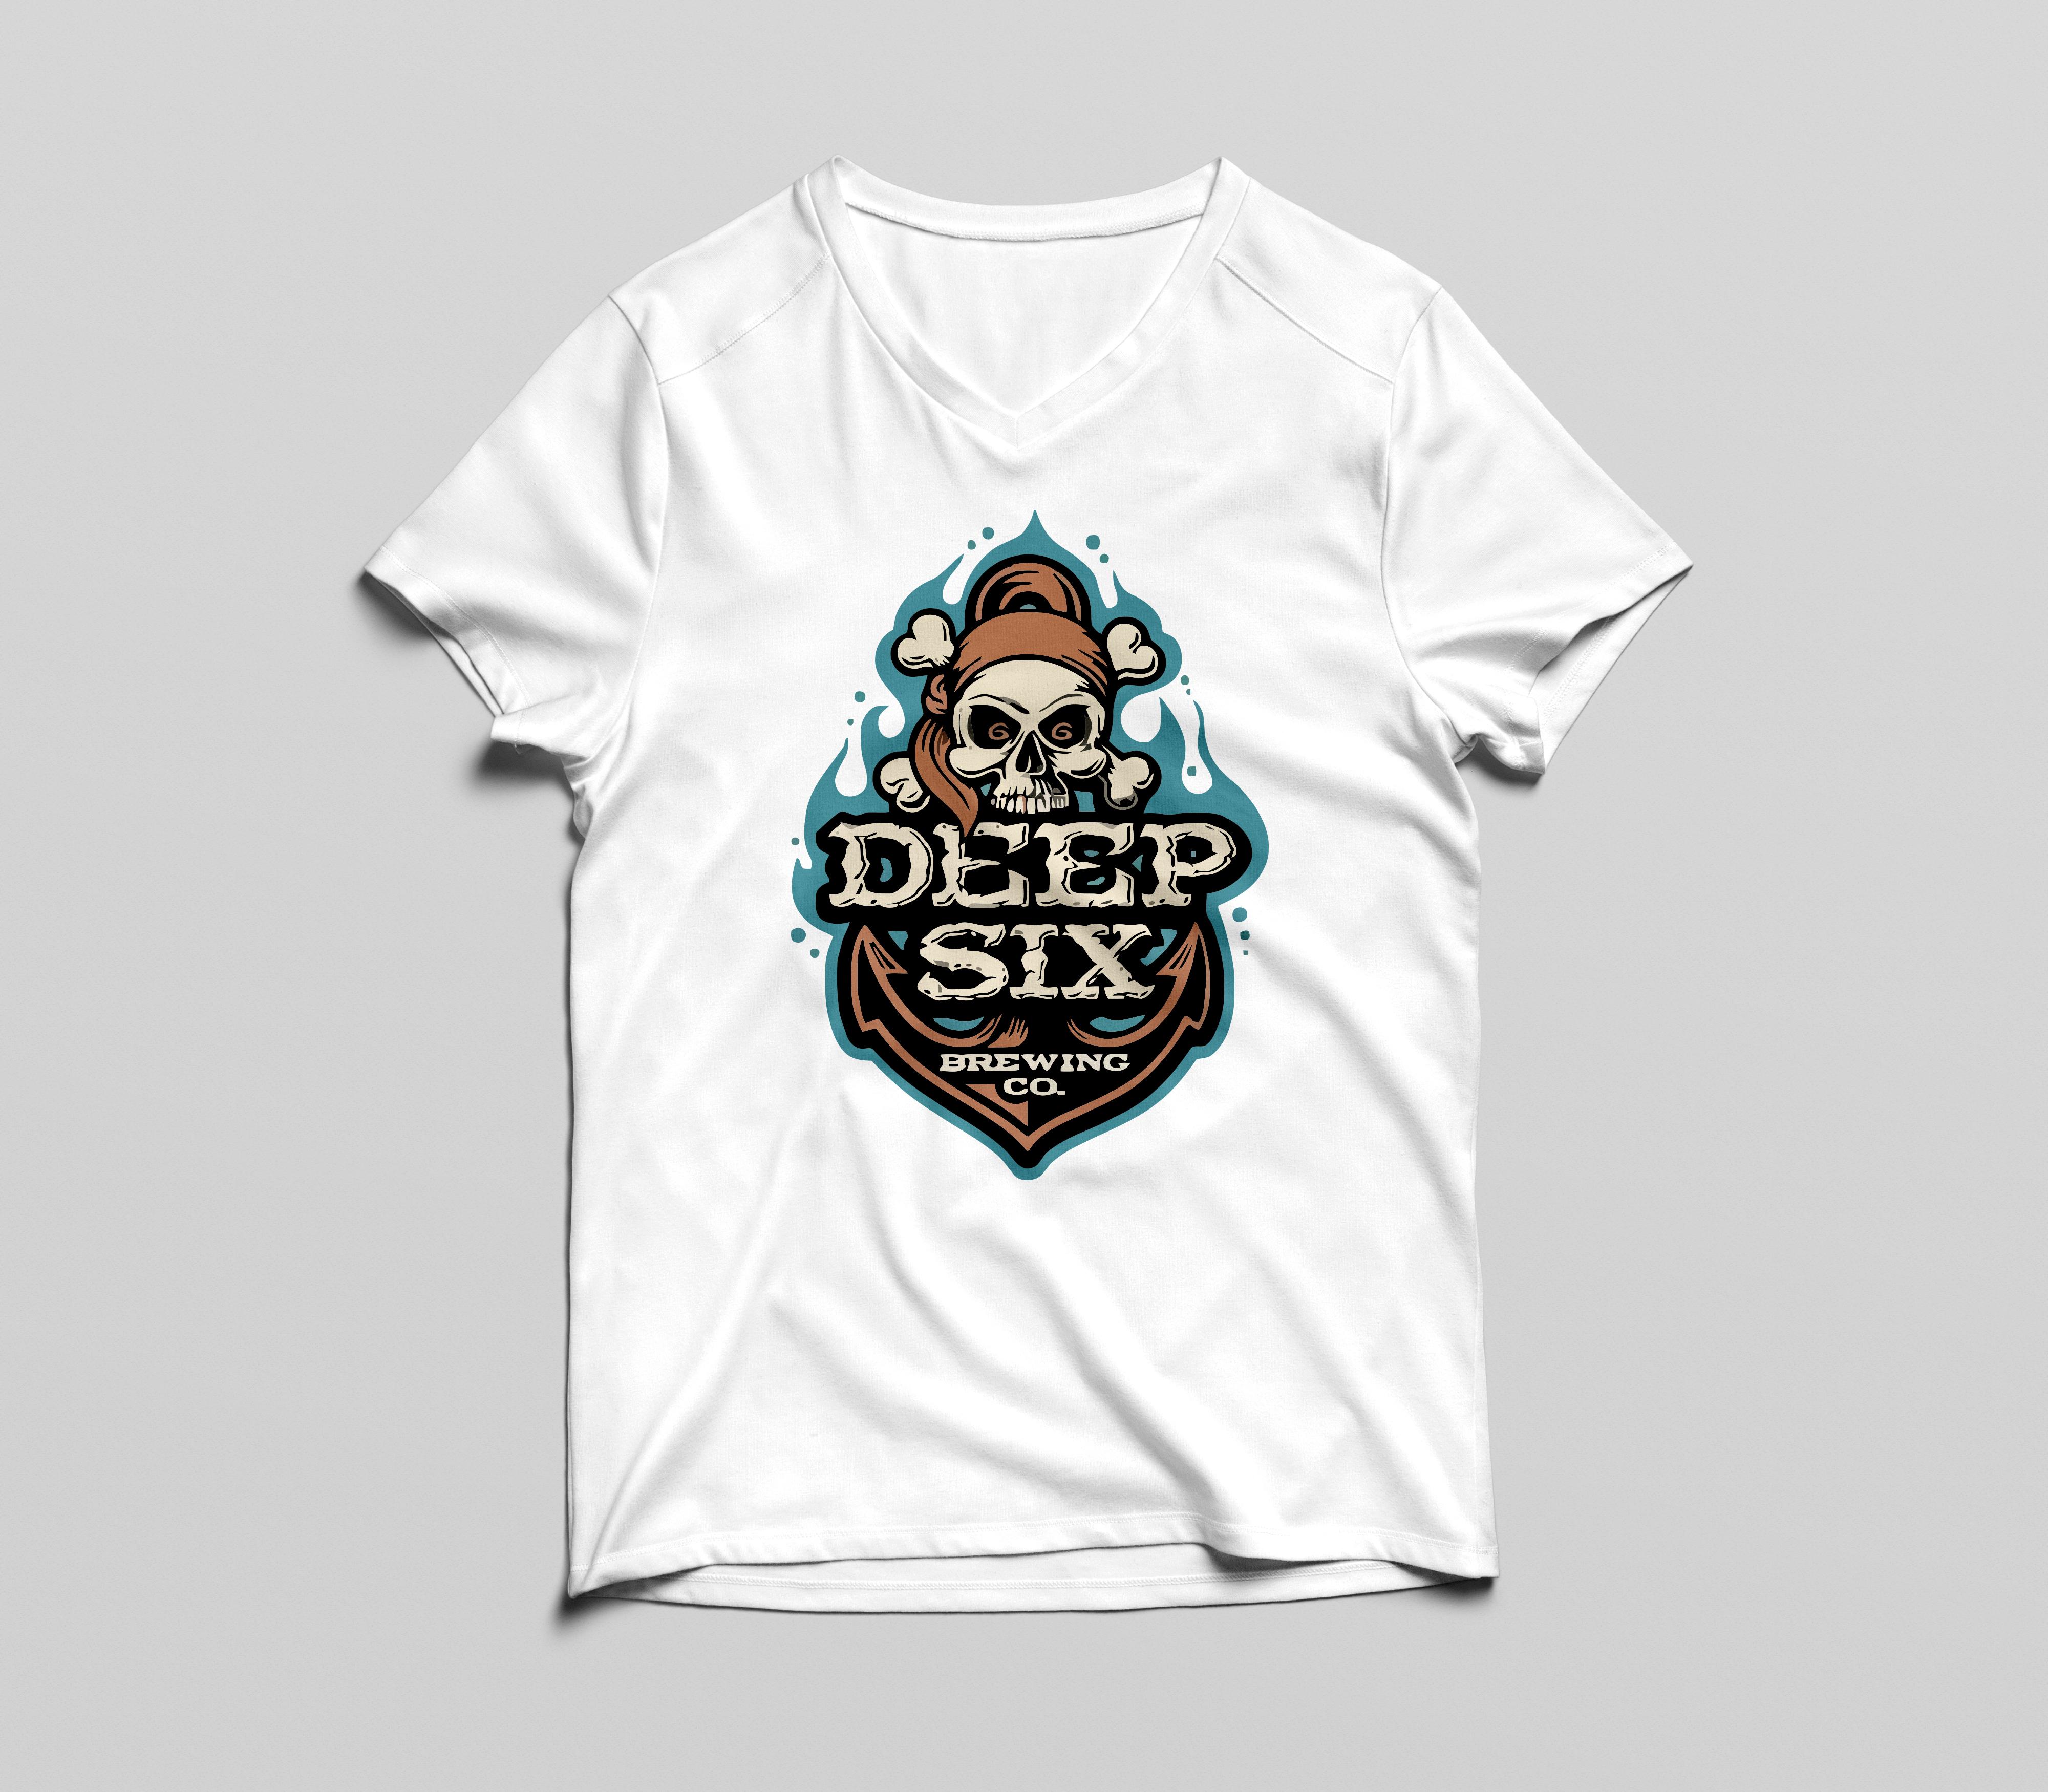 Amazing Custom t shirt design for you